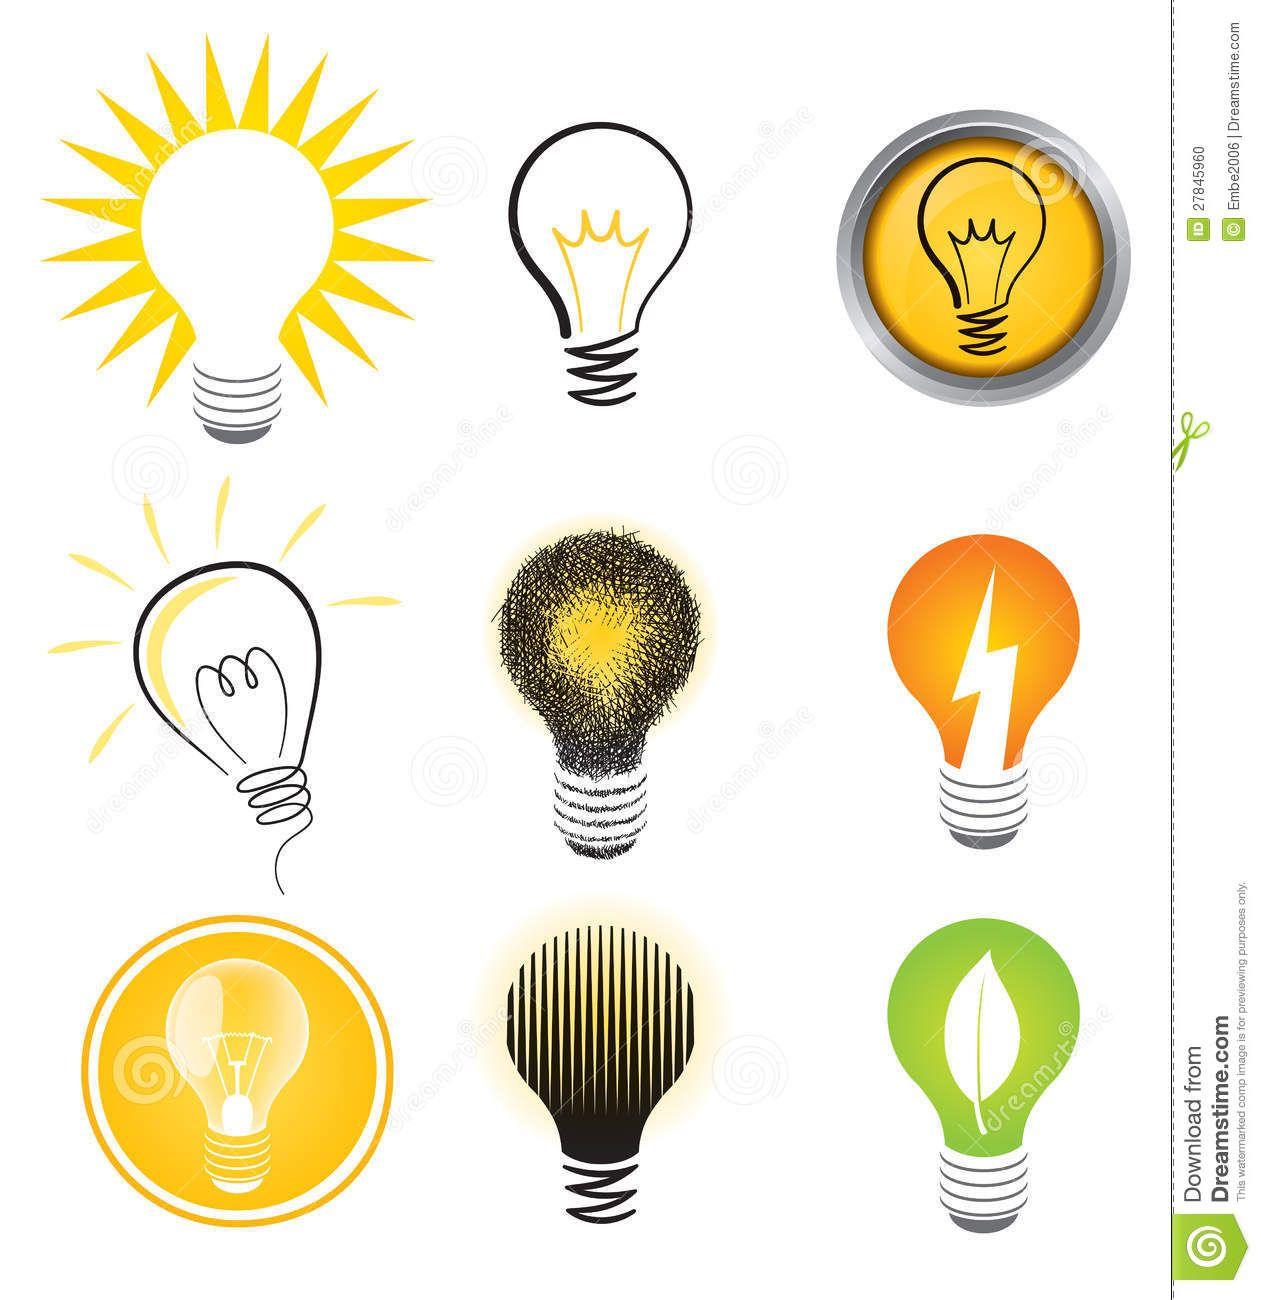 light bulb logo vector Google Search Light bulb logo